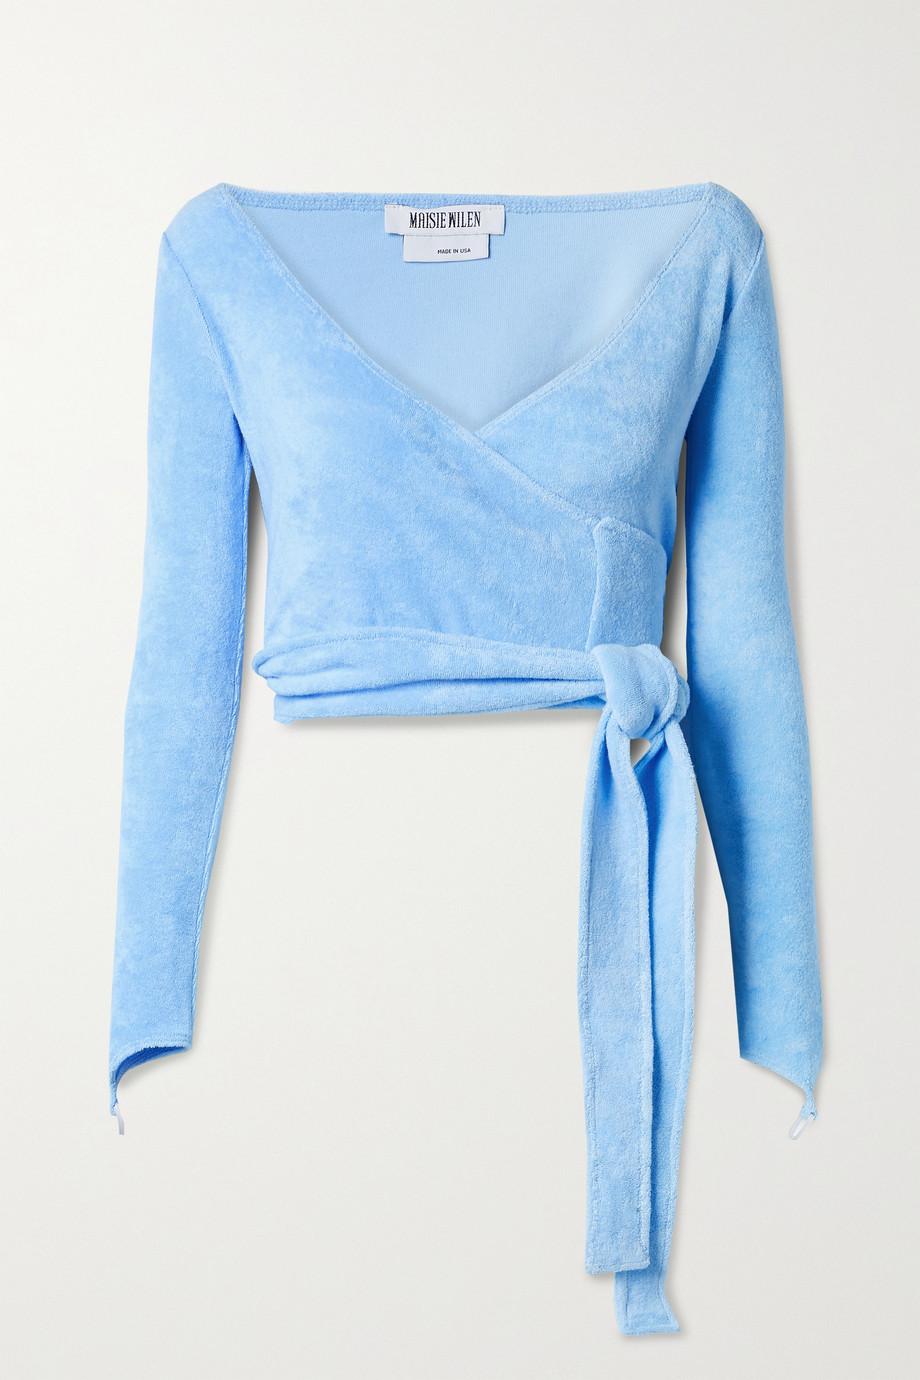 Maisie Wilen Dramady cropped cotton-blend terry wrap top